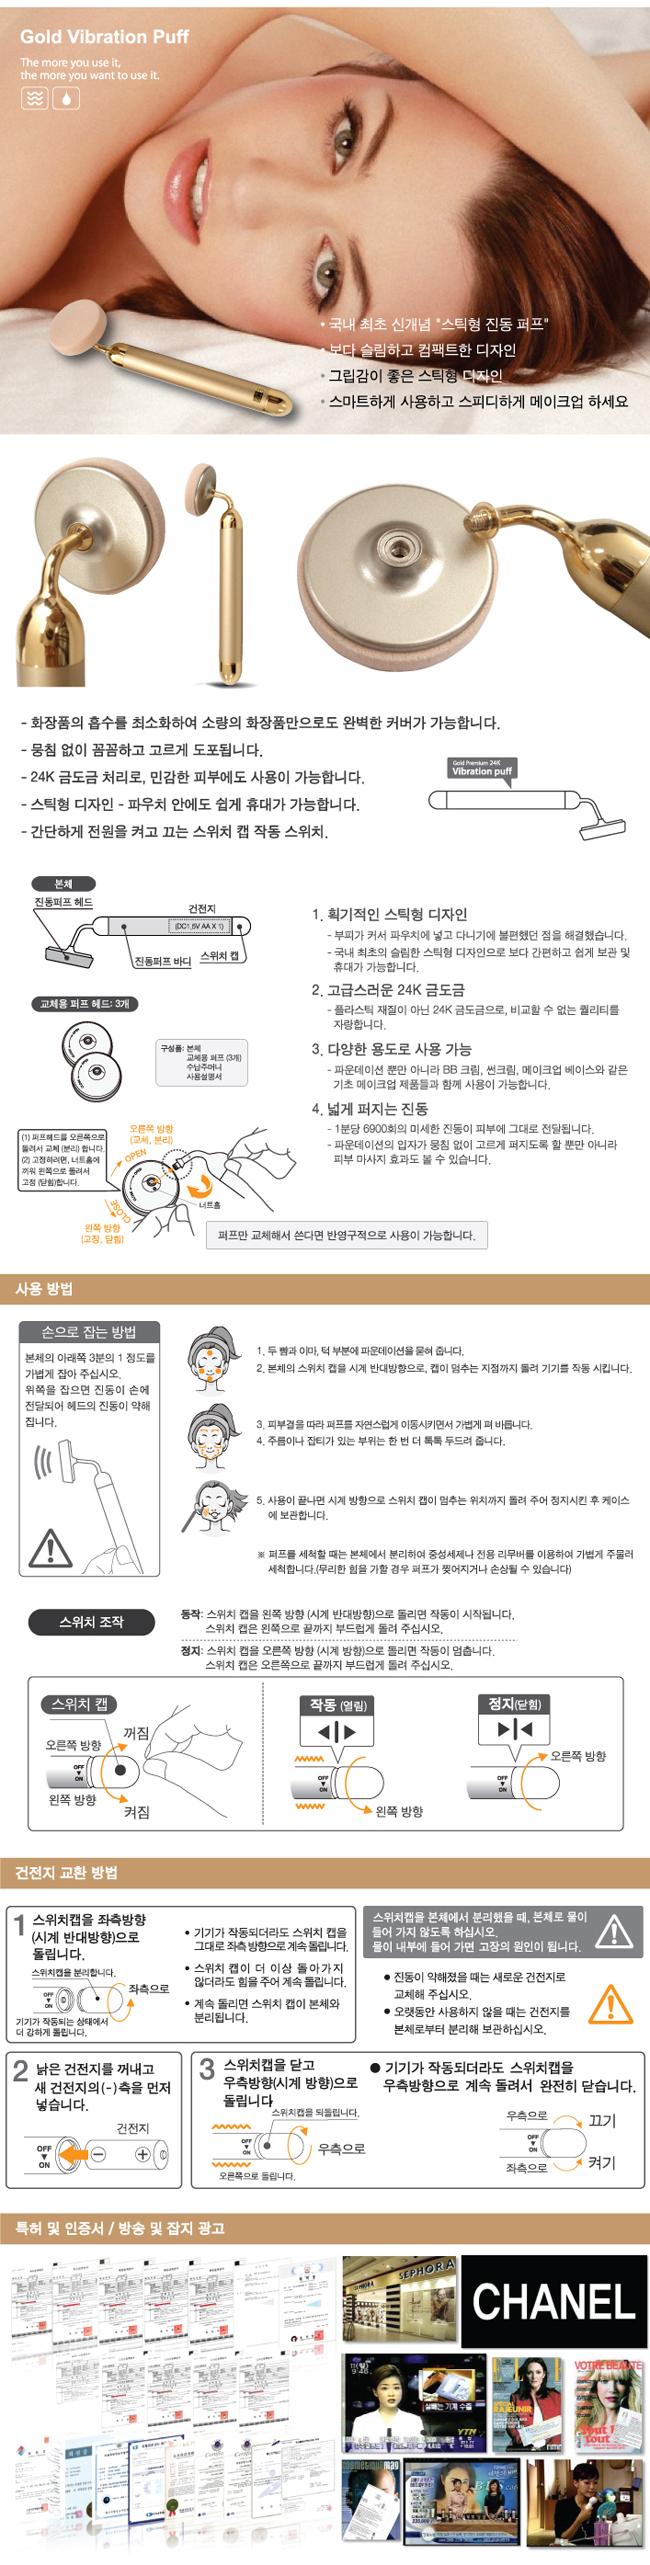 Korean Beauty Personal Care Gk21globalcom Dana A Acne Treatment Device Gold Puff Page 2